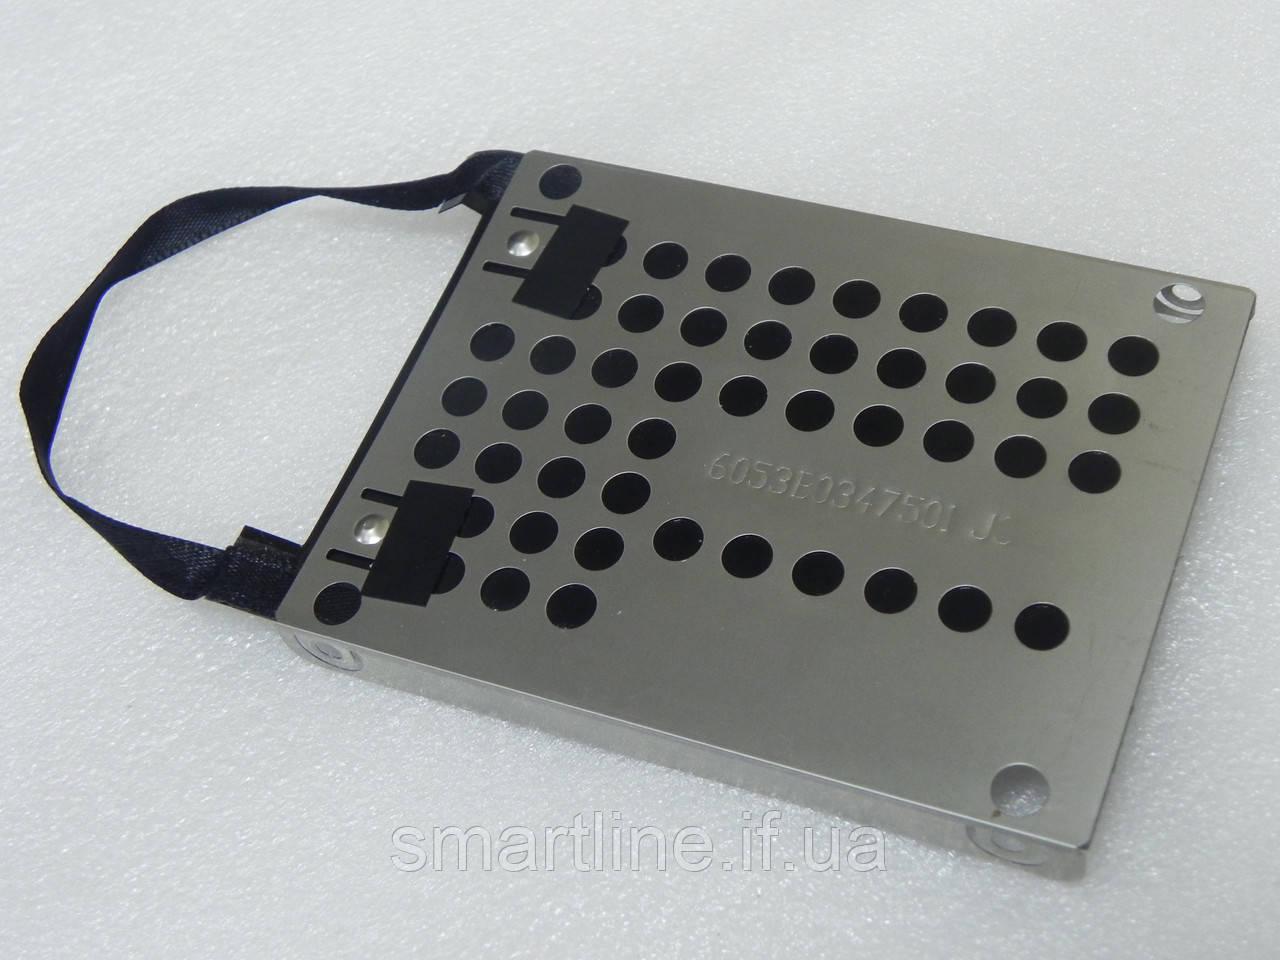 Шахта HDD для ноутбука Toshiba Satellite L300, L305, L305D, L355, L355